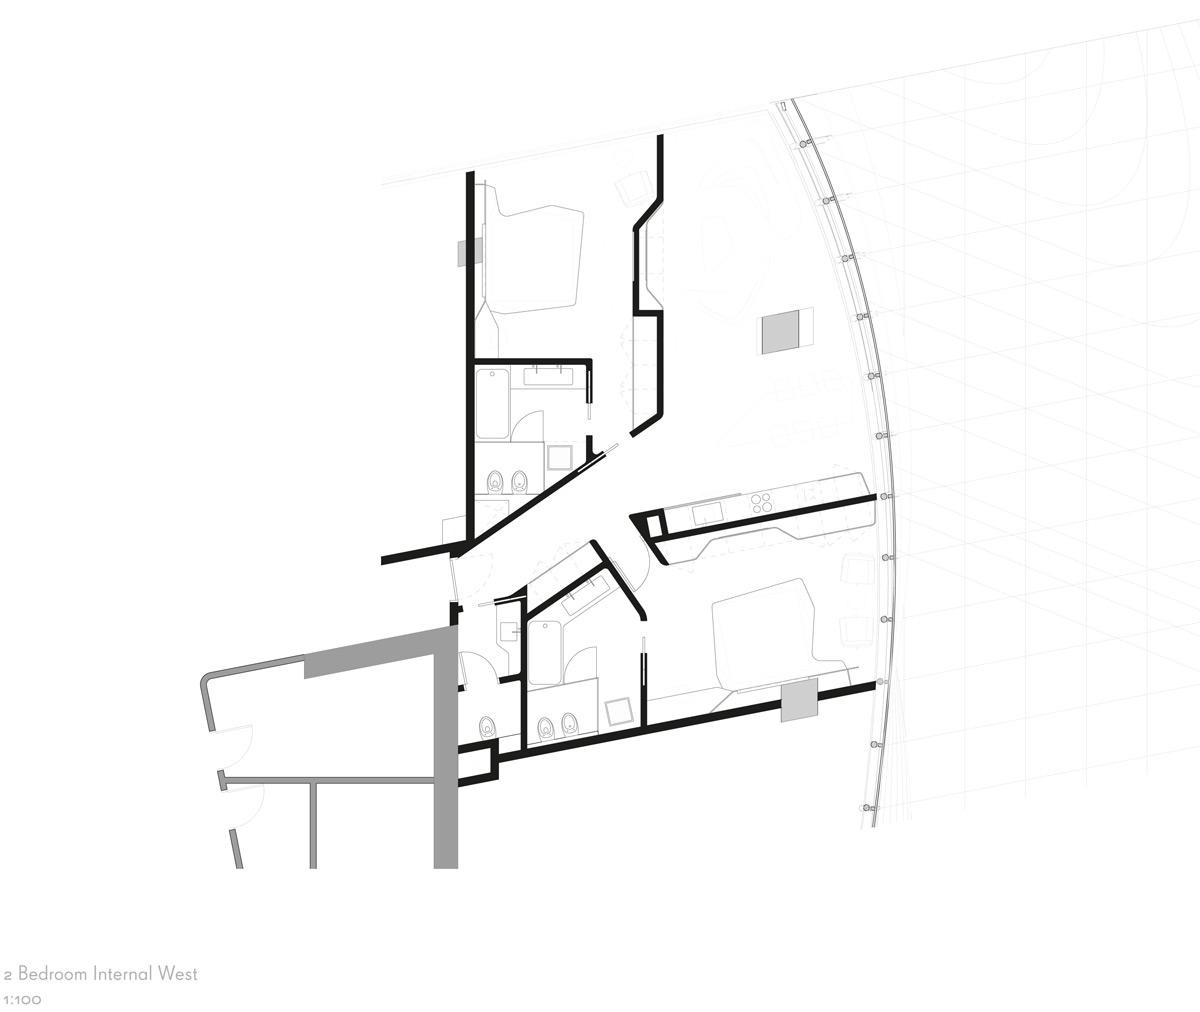 Zaha Hadid Designs Interiors For Dubai S Opus Office Tower